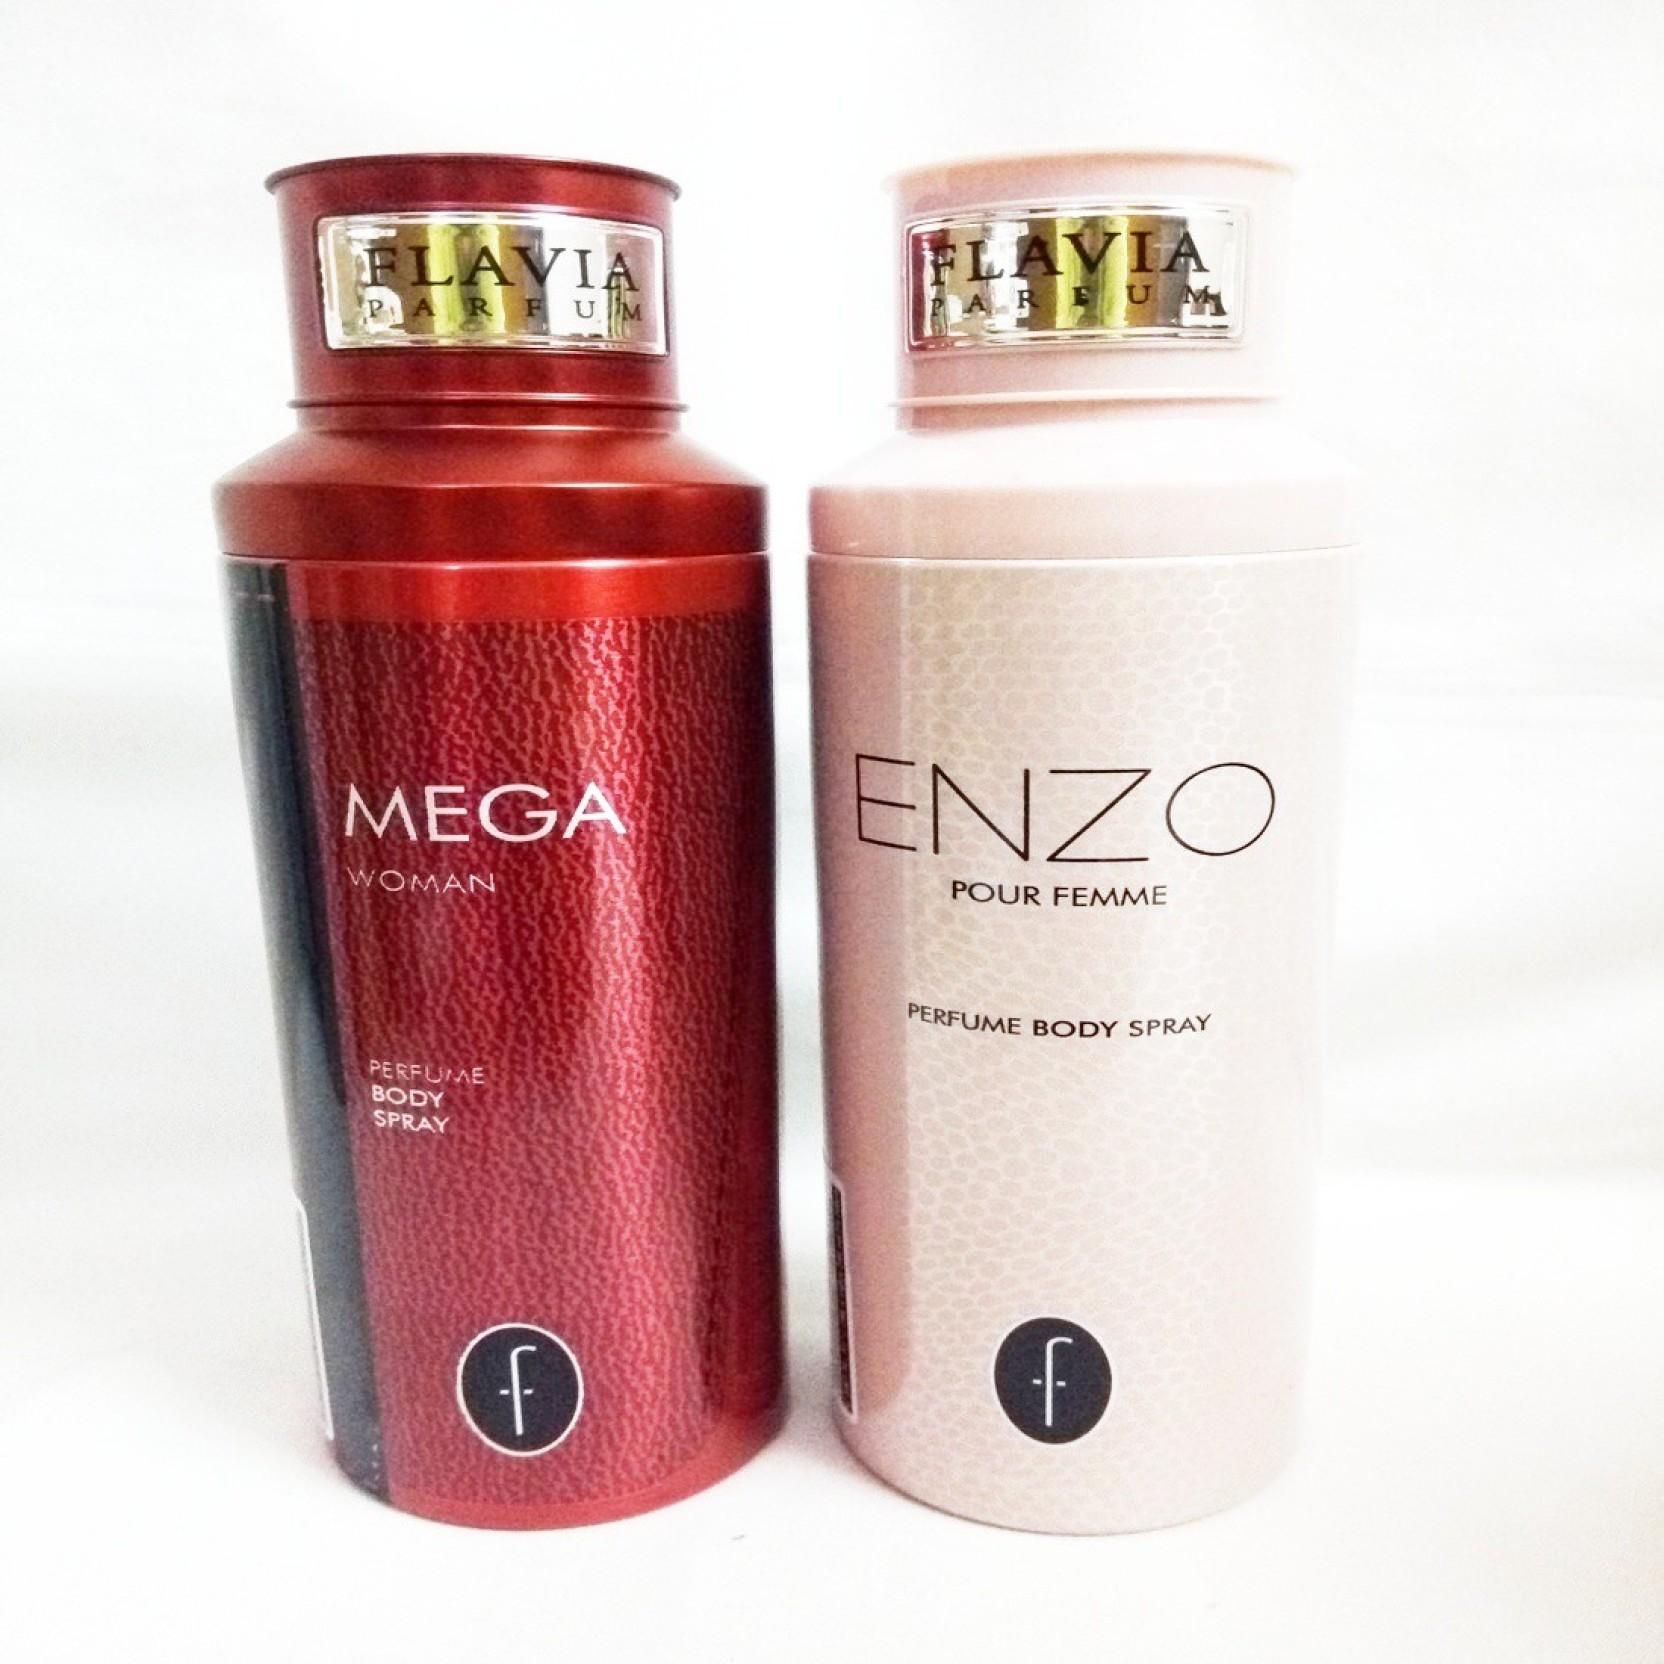 b745064cc44 Flavia MEGA AND ENZO Perfume Body Spray - For Women